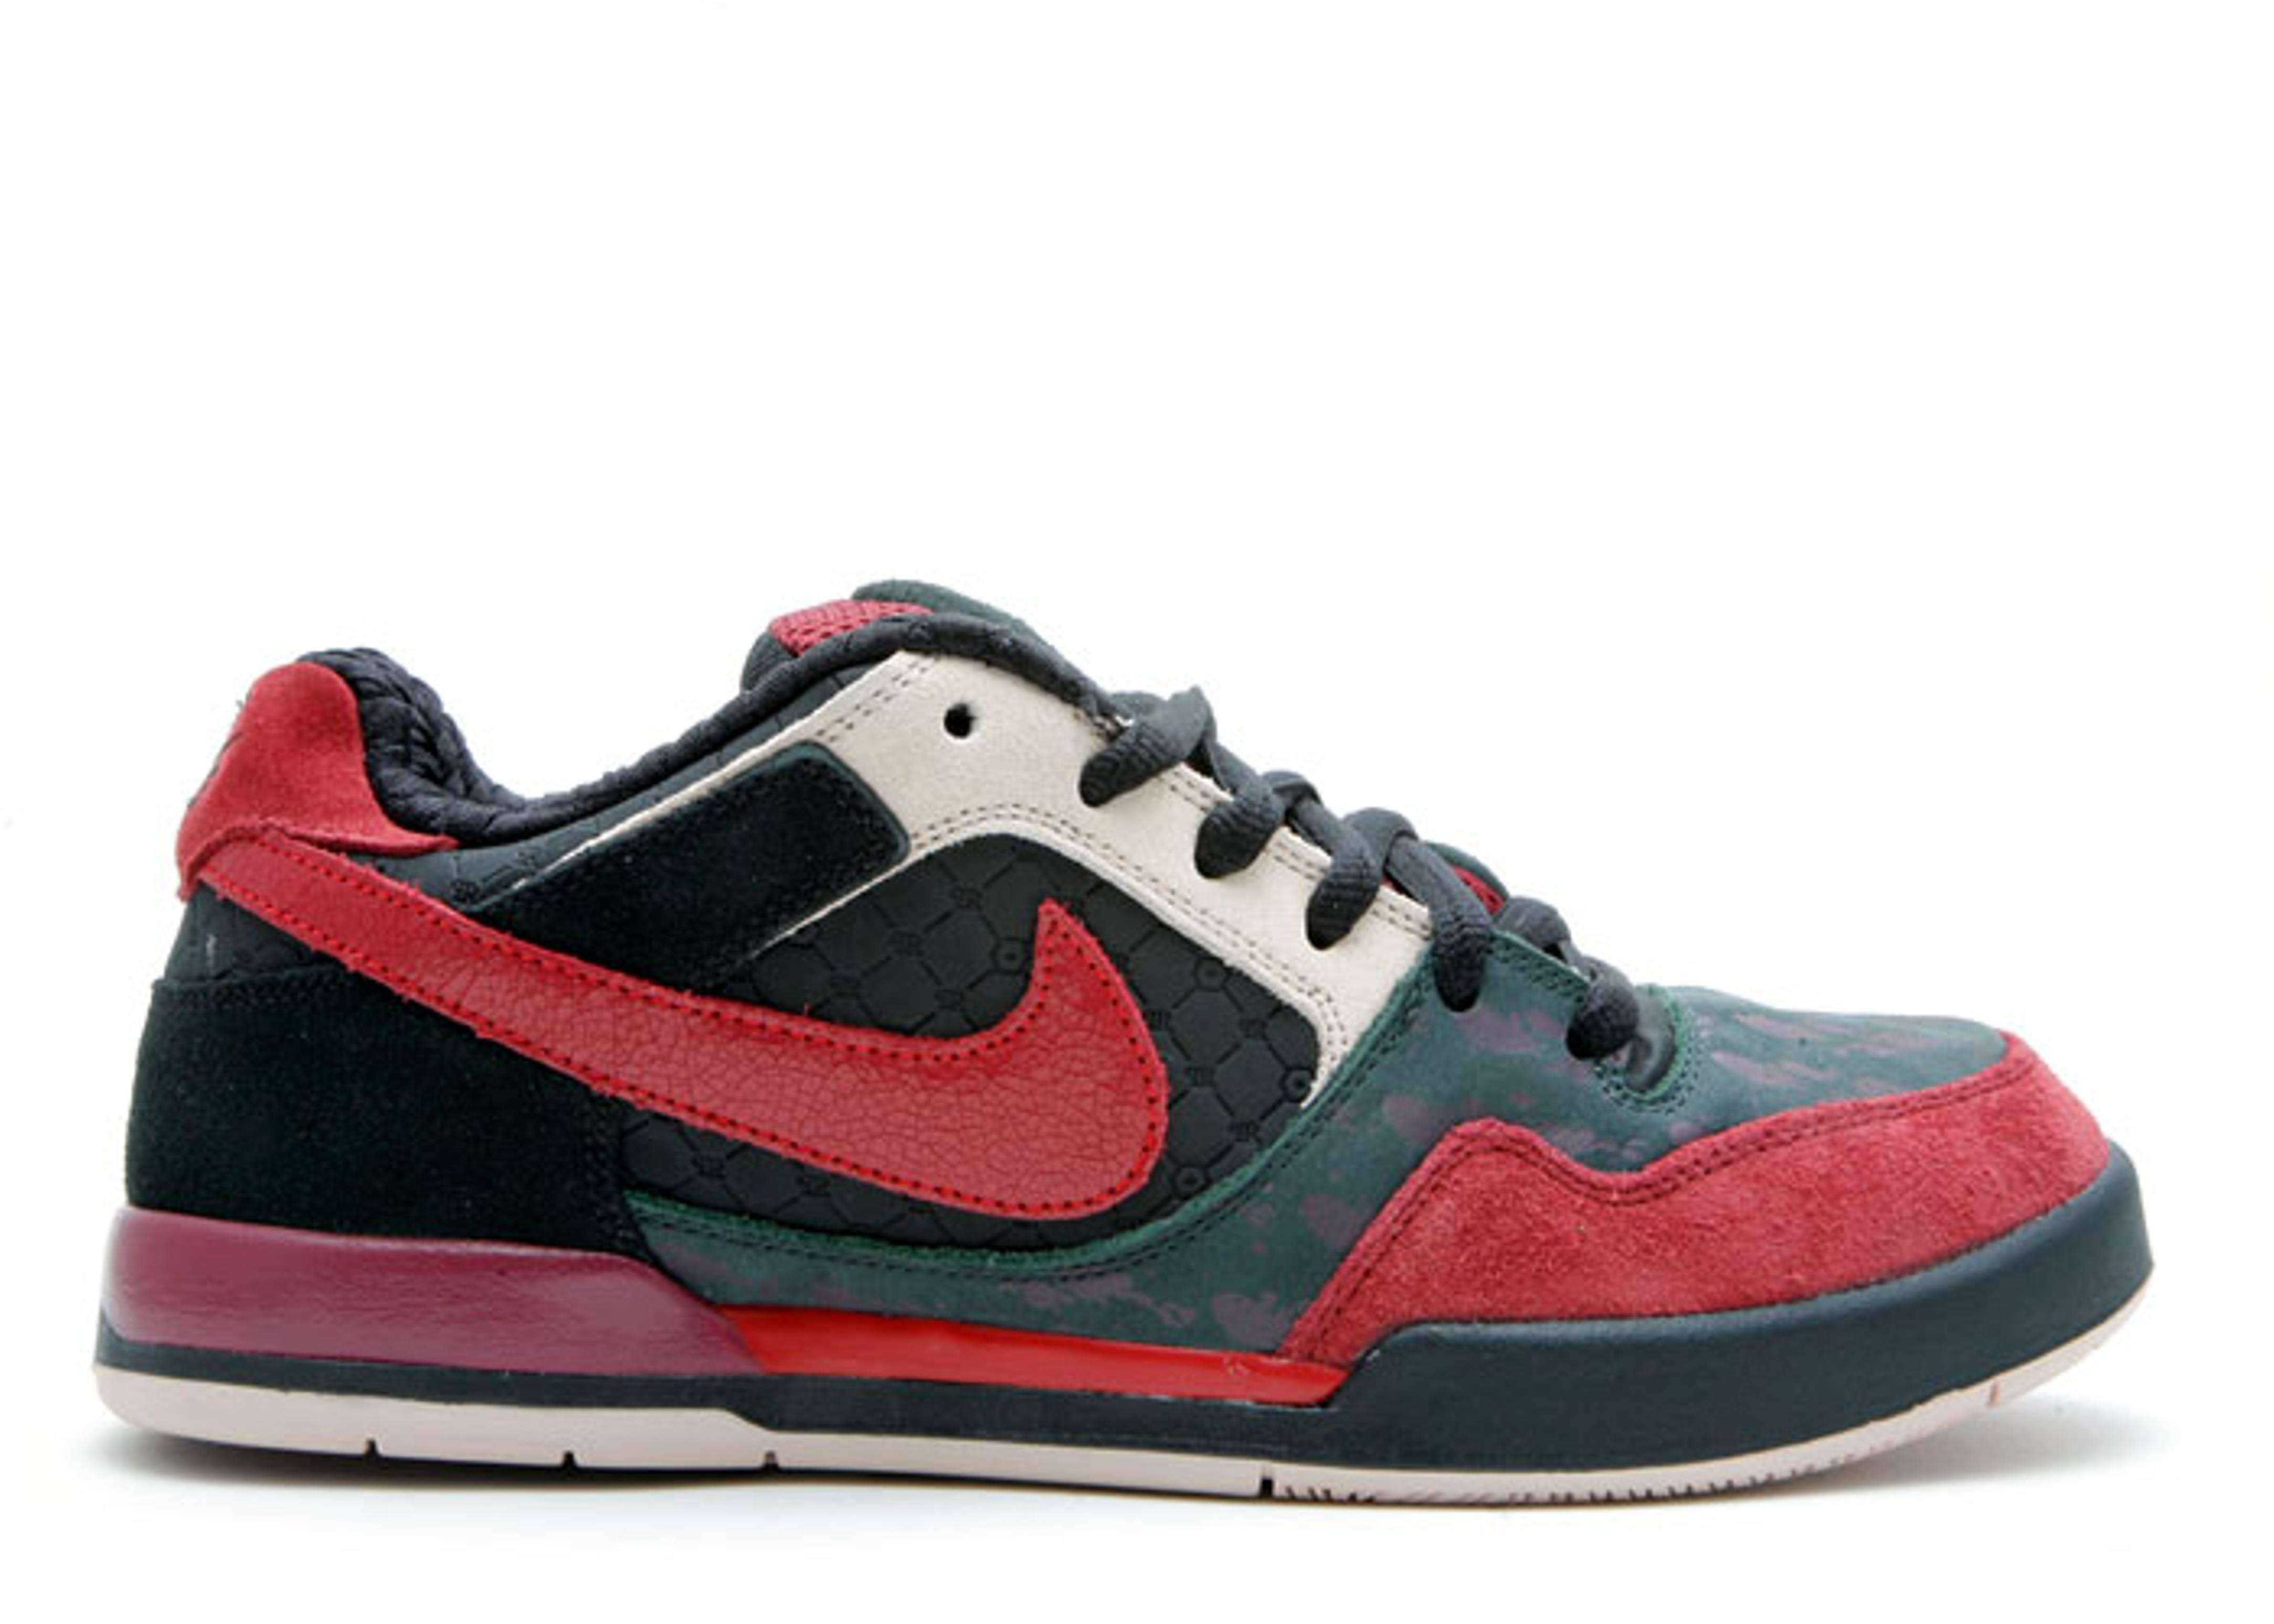 30a021189a0bb Paul Rodriguez 2 Zoom Air - Nike - 315459 061 - black varsity red ...